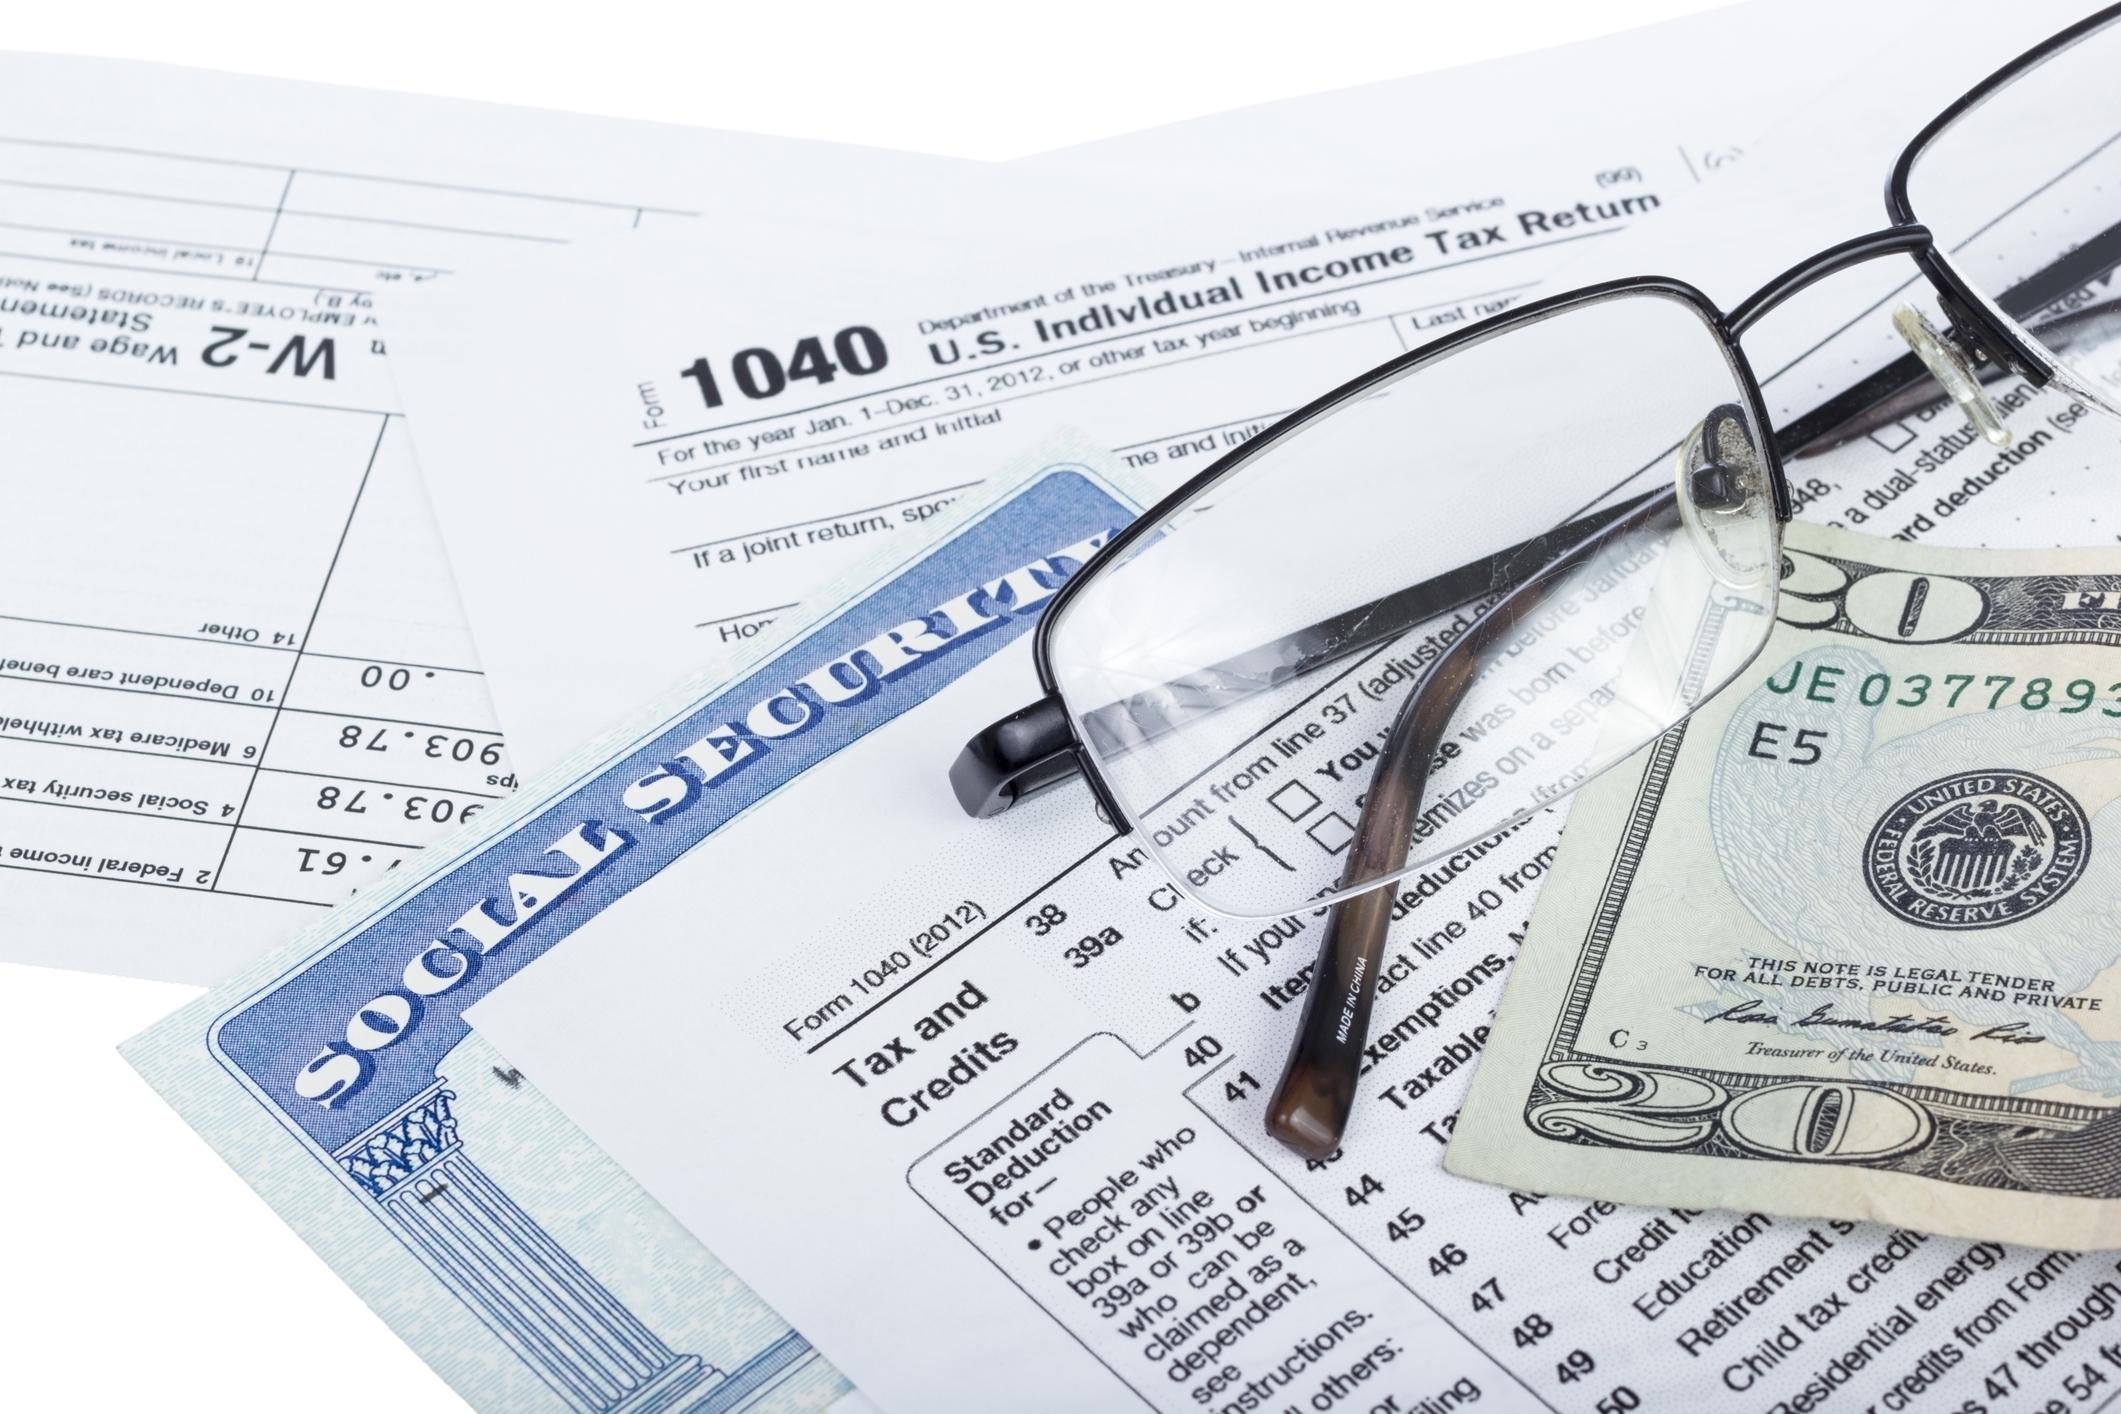 A Social Security card next to IRS tax paperwork.